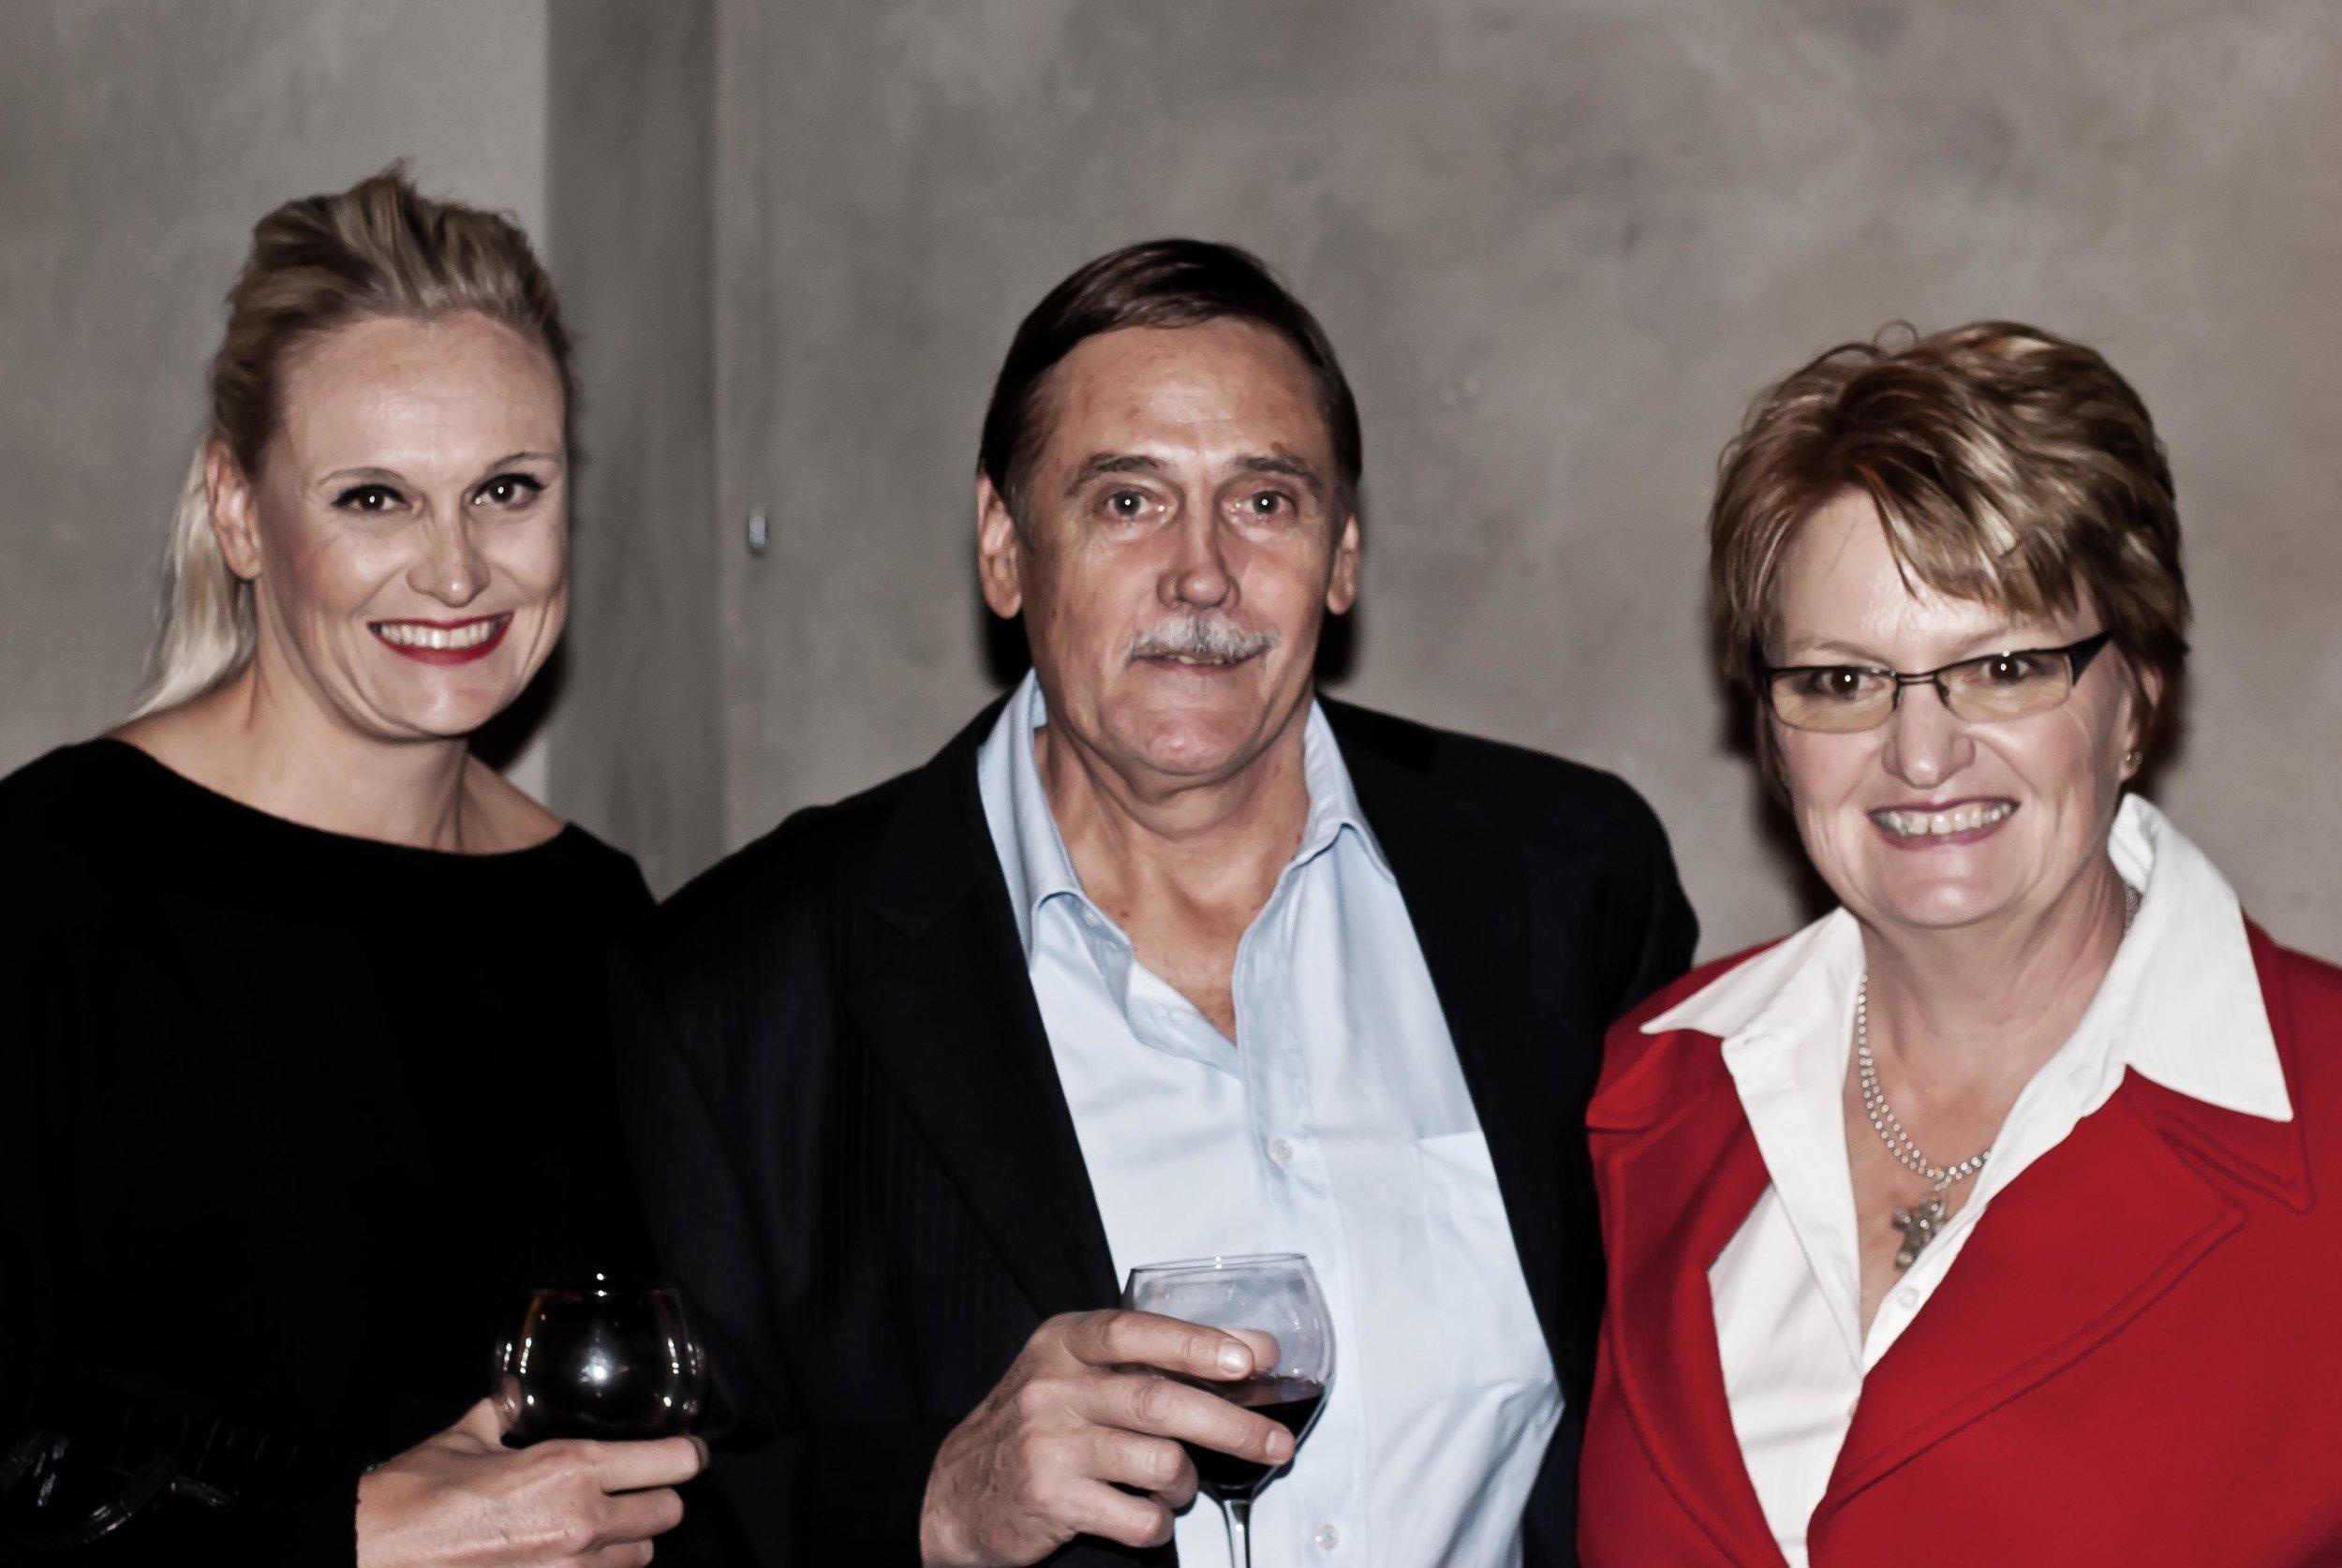 Karin Potgieter, Thom & Issie.jpg